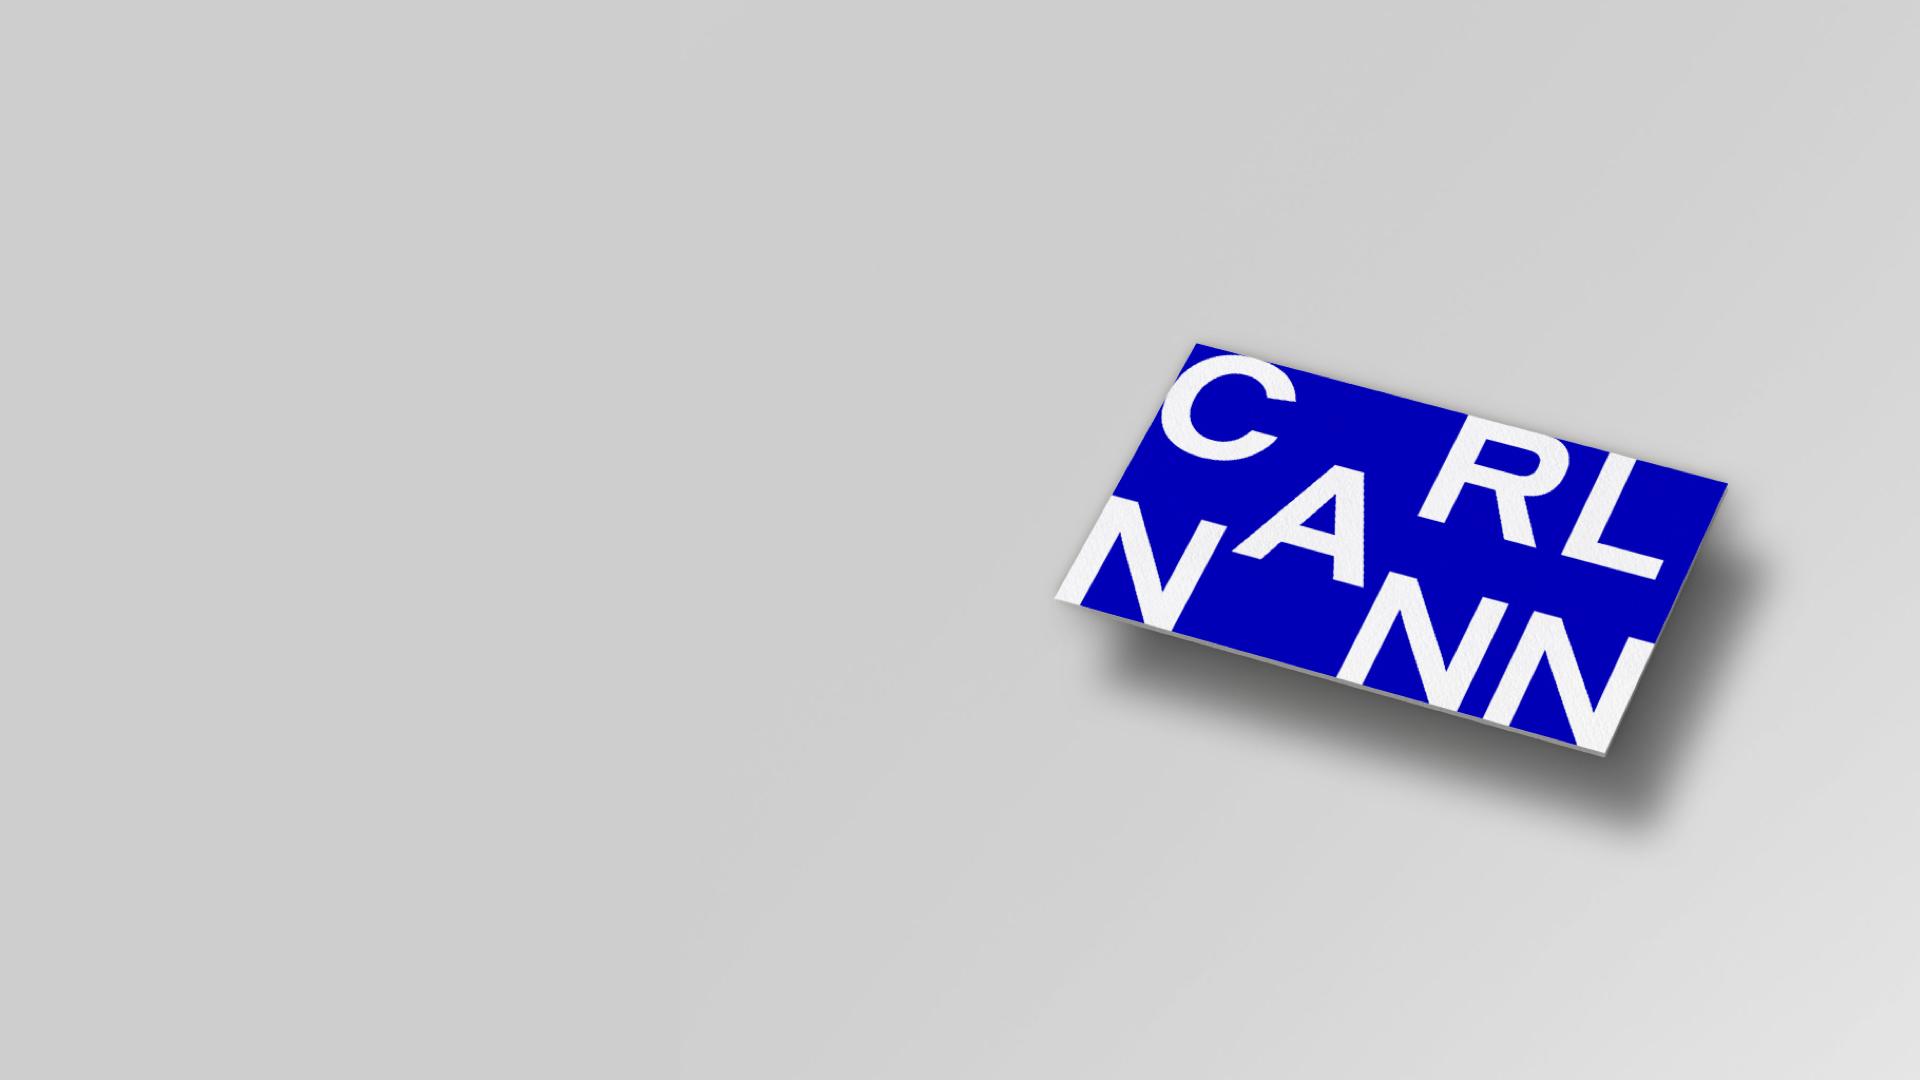 White CarlNann Logo on blue square on grey background